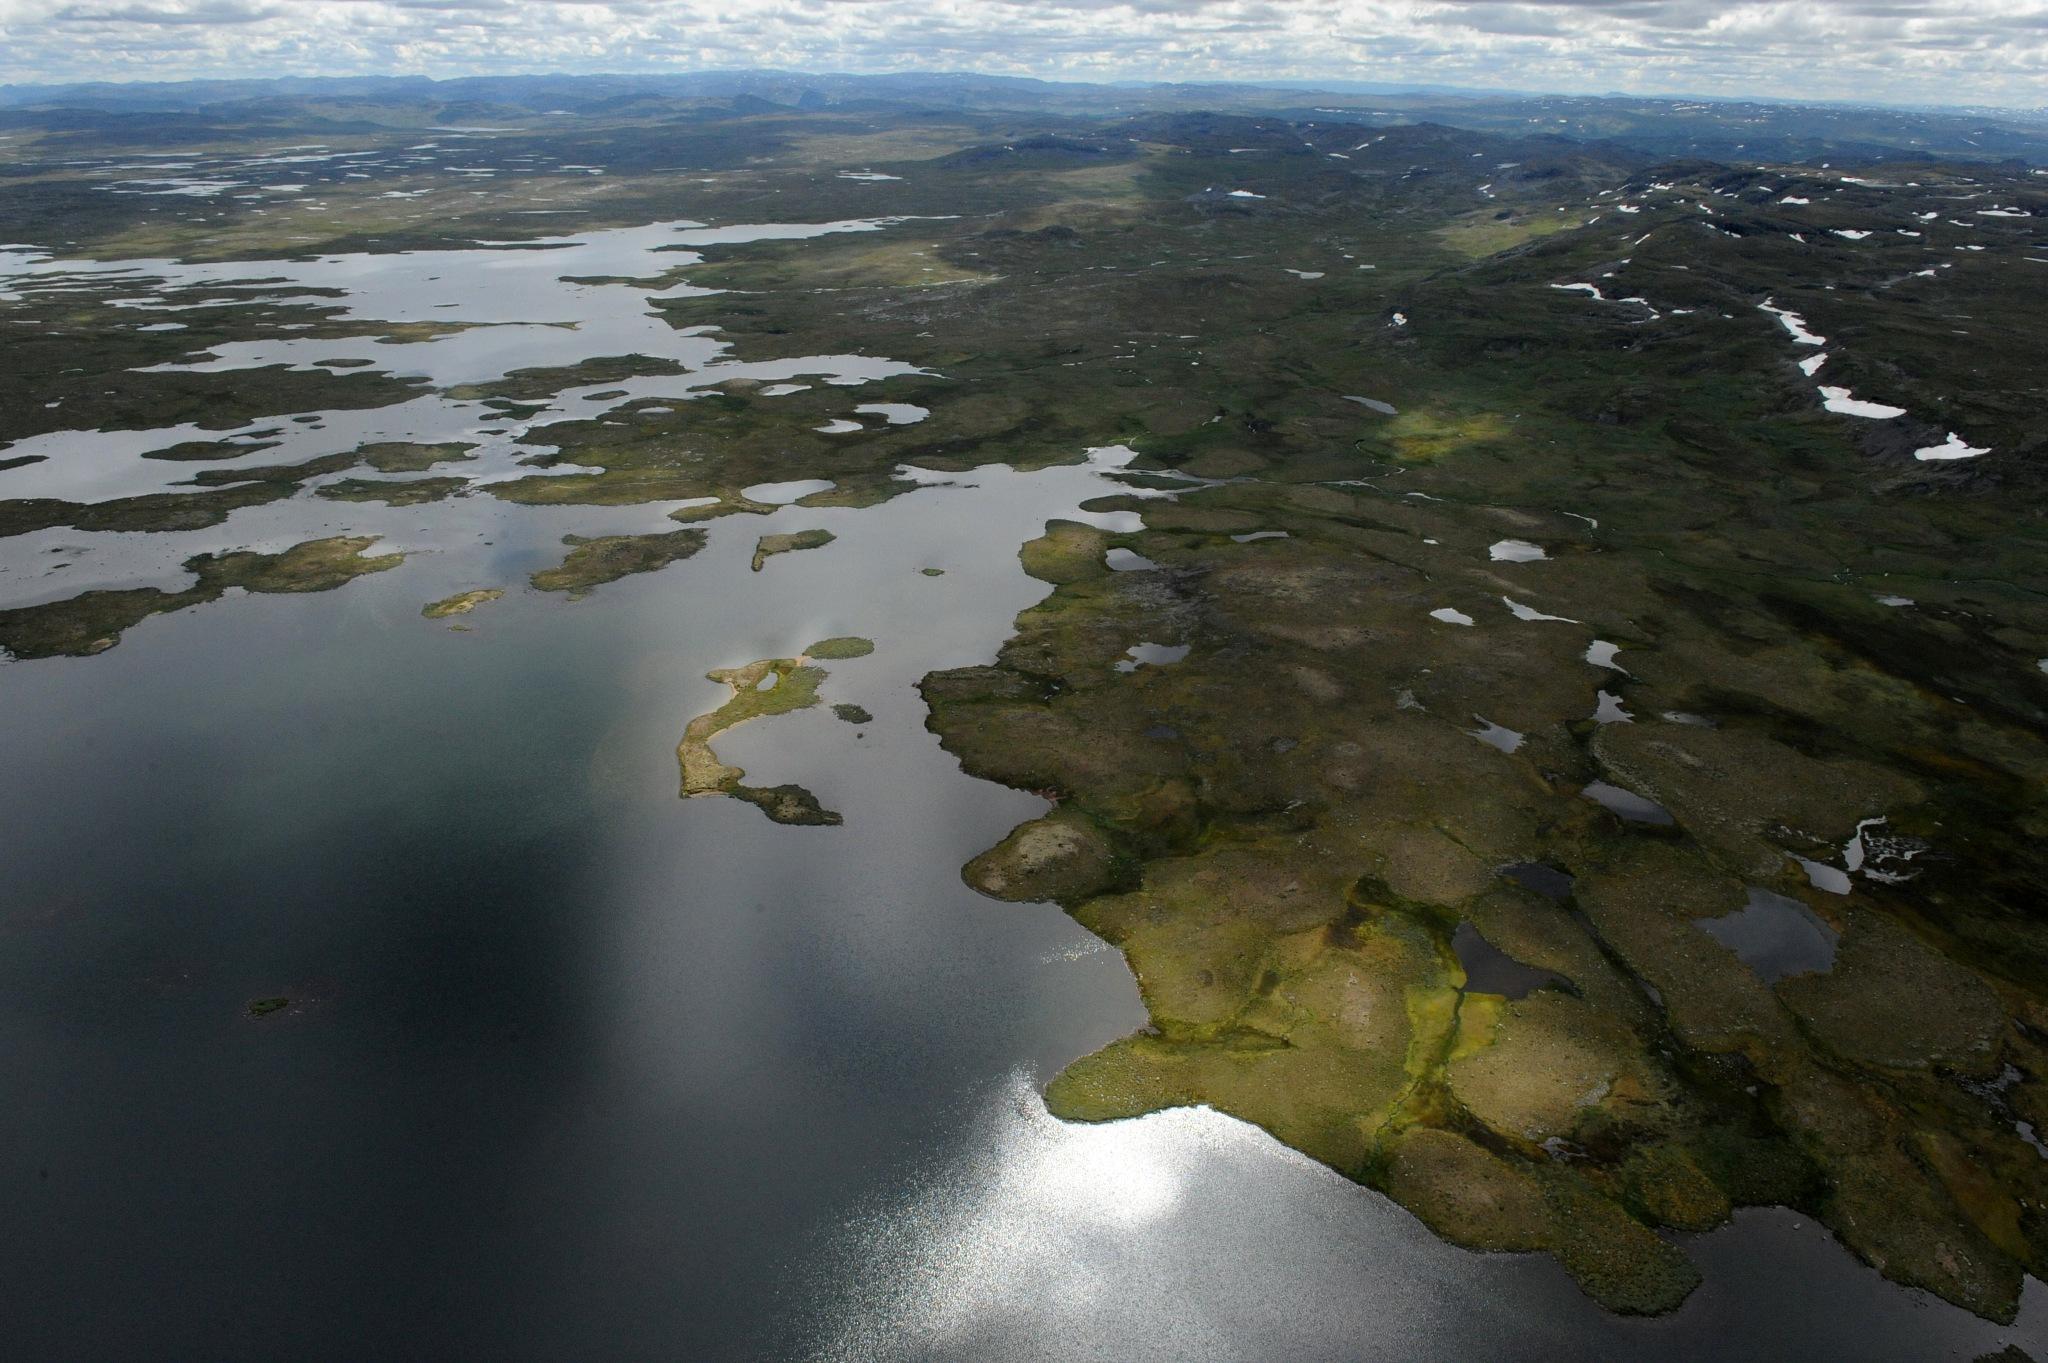 Hardangervidda, Hordaland, Norway by Lasse Tur